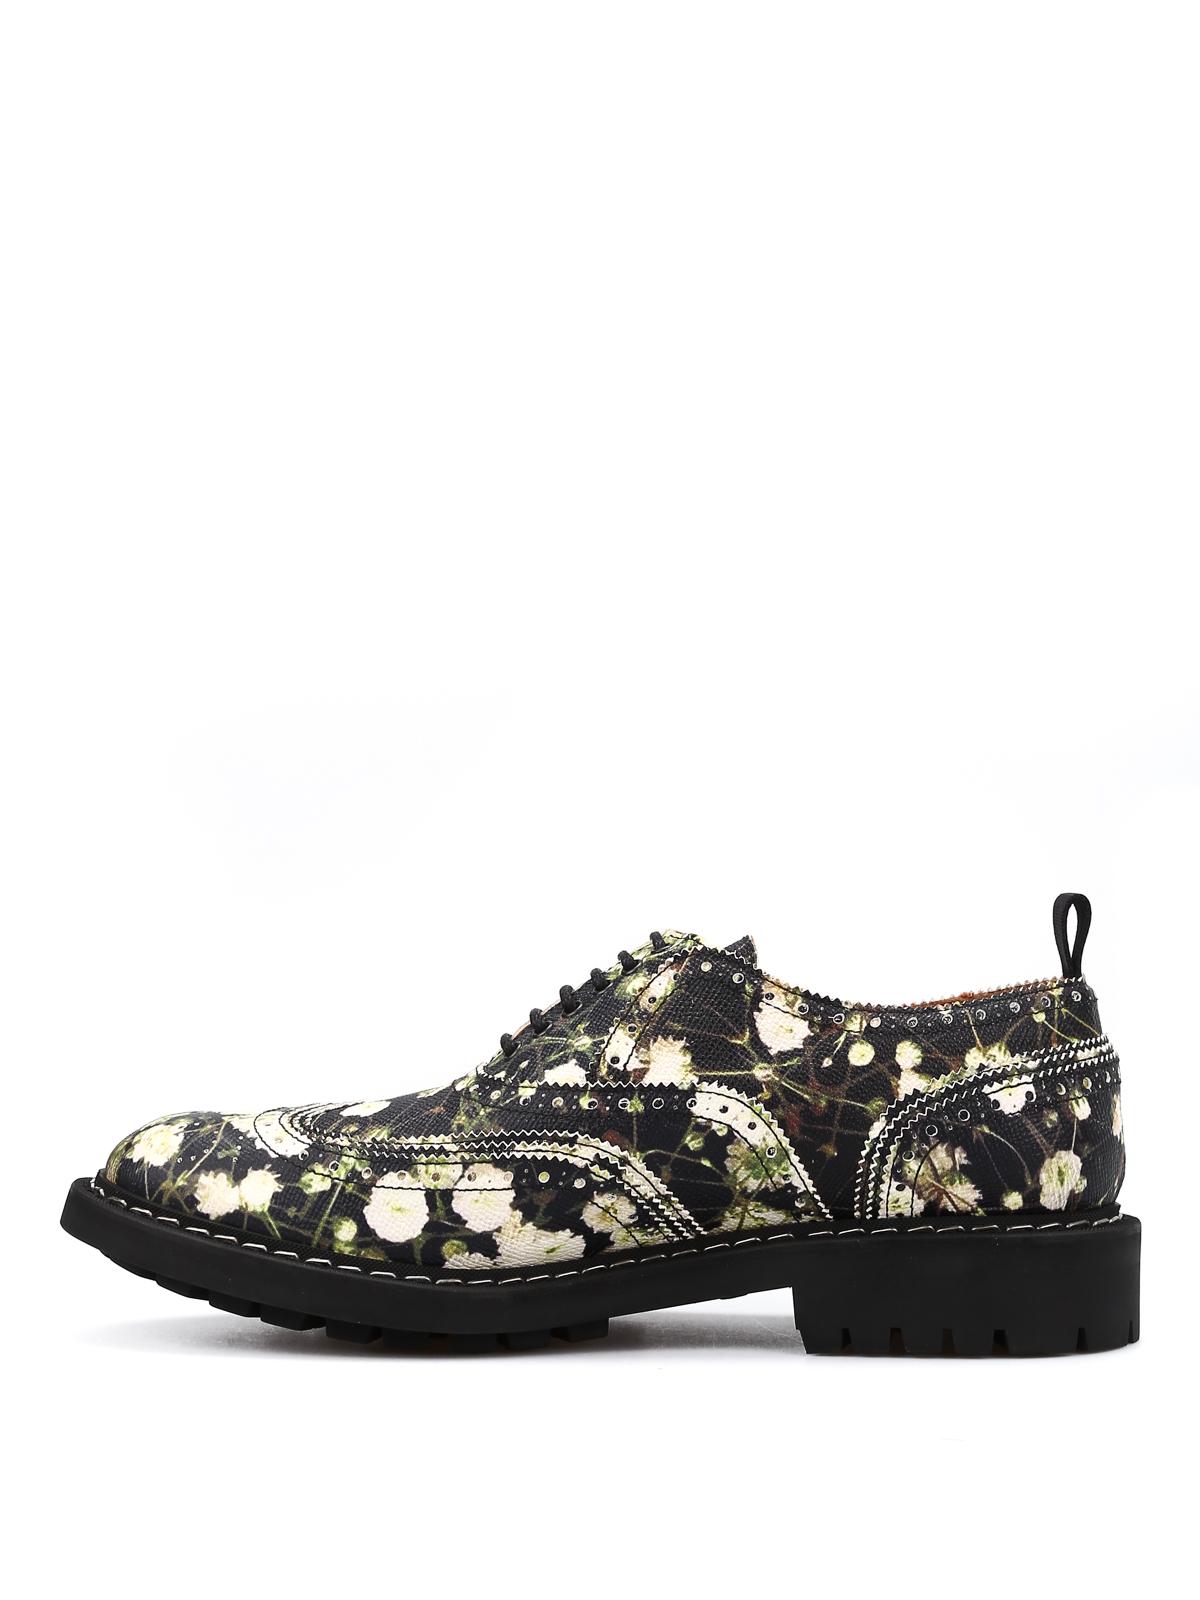 Chaussures - Chaussures À Lacets Givenchy VZVXB3